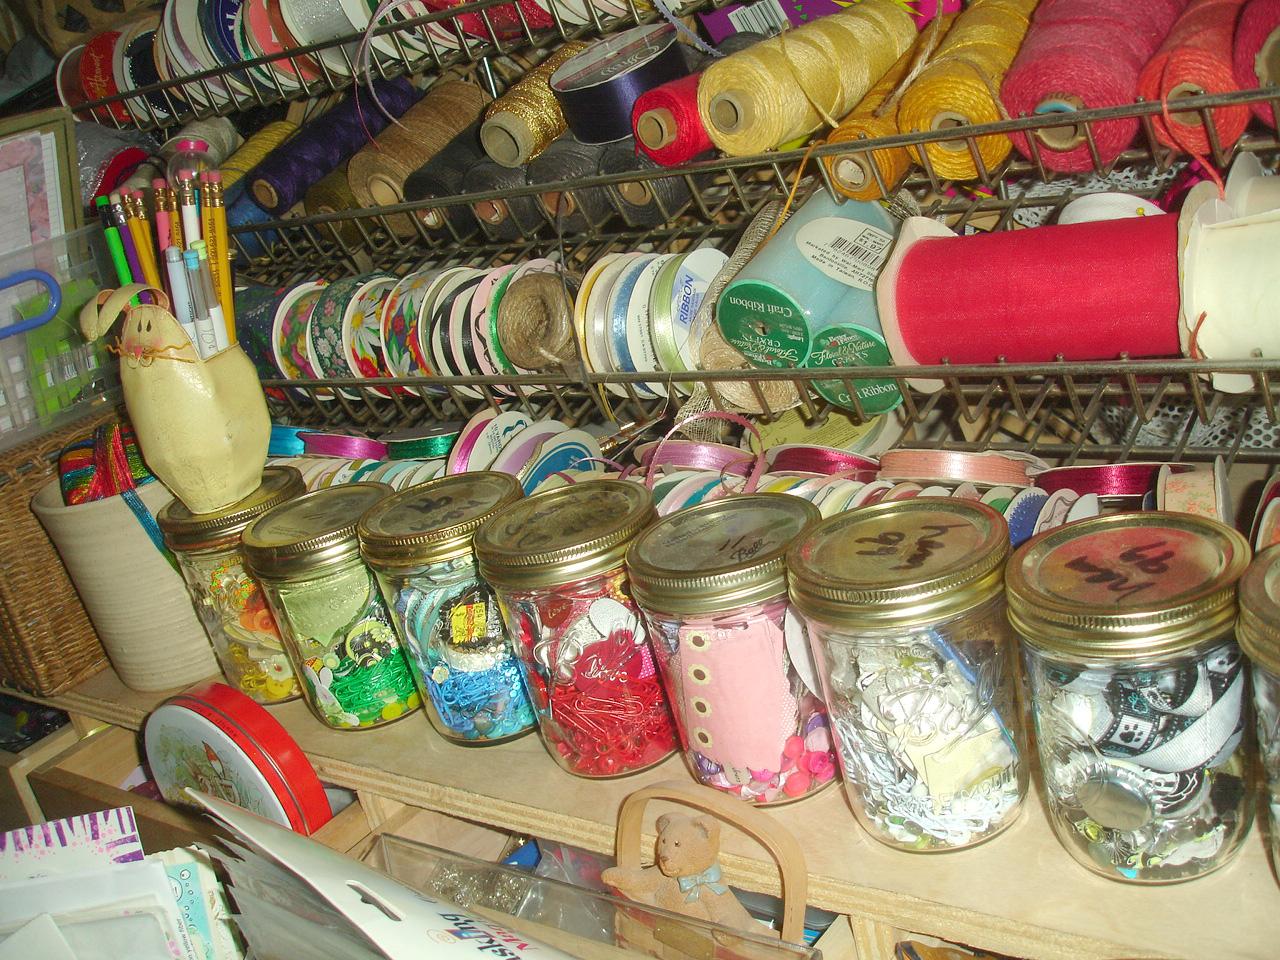 Reorganizing Room: Frugal Measures: Reorganizing Stamp Room